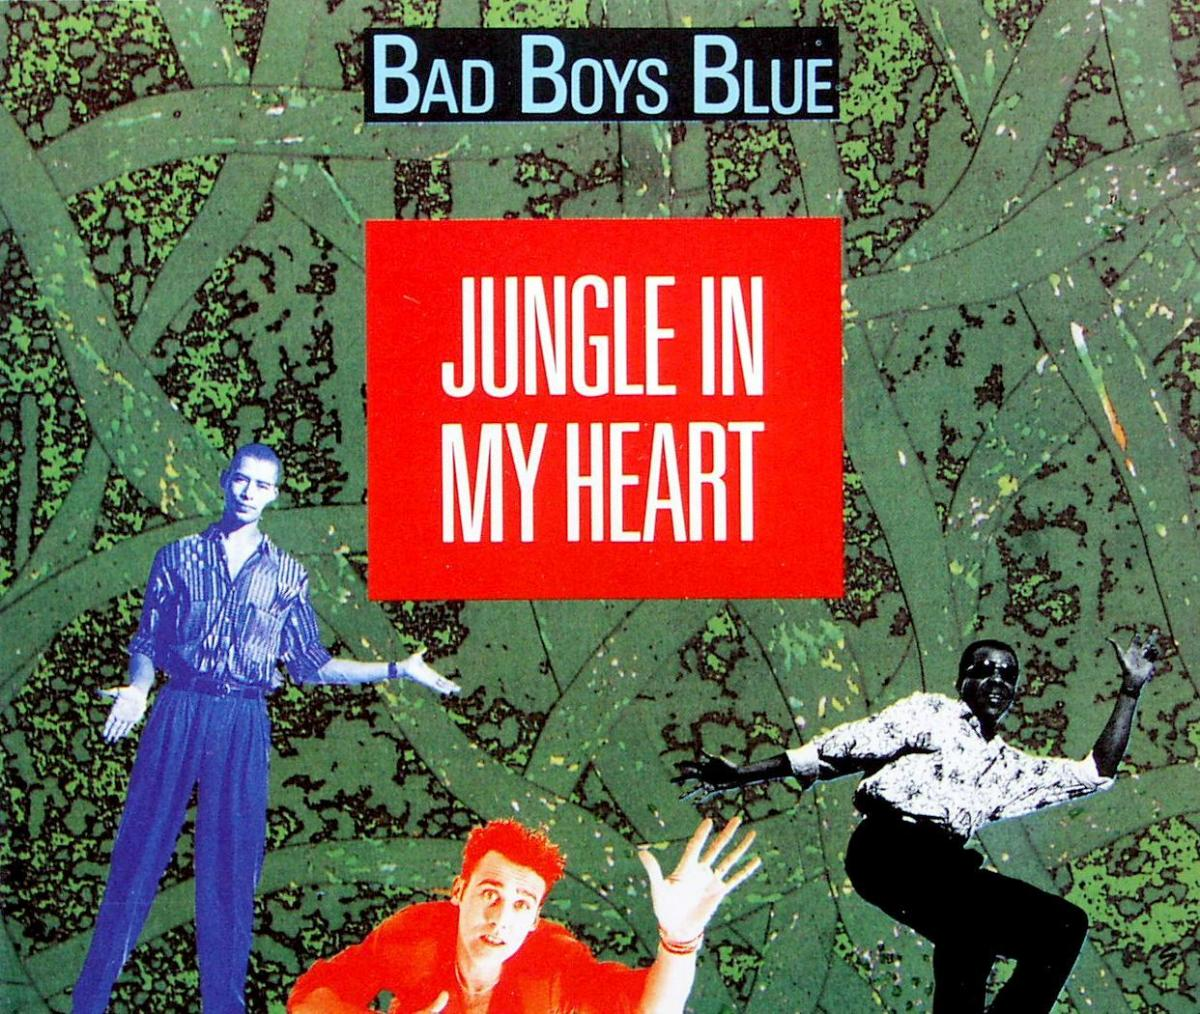 Bad Boys Blue - Jungle In My Heart [CD-Single]